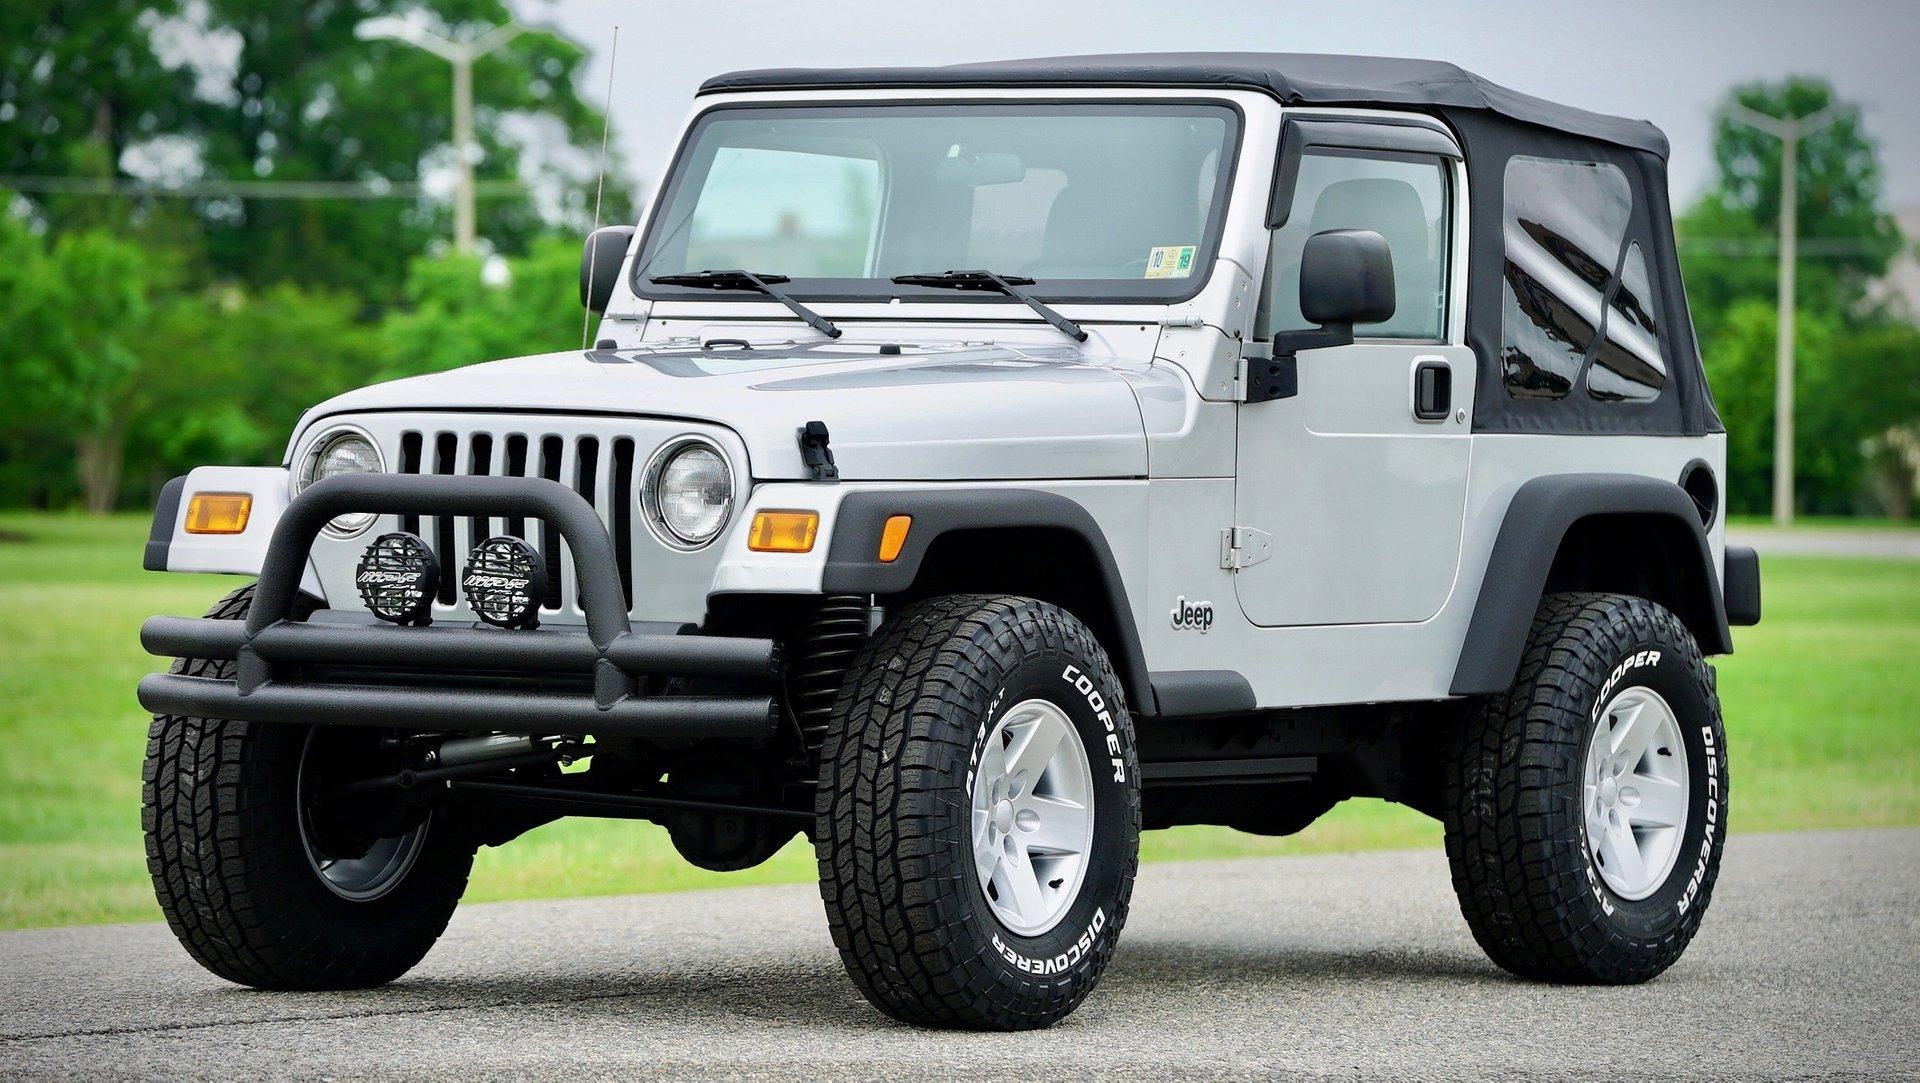 2006 jeep wrangler 2dr x